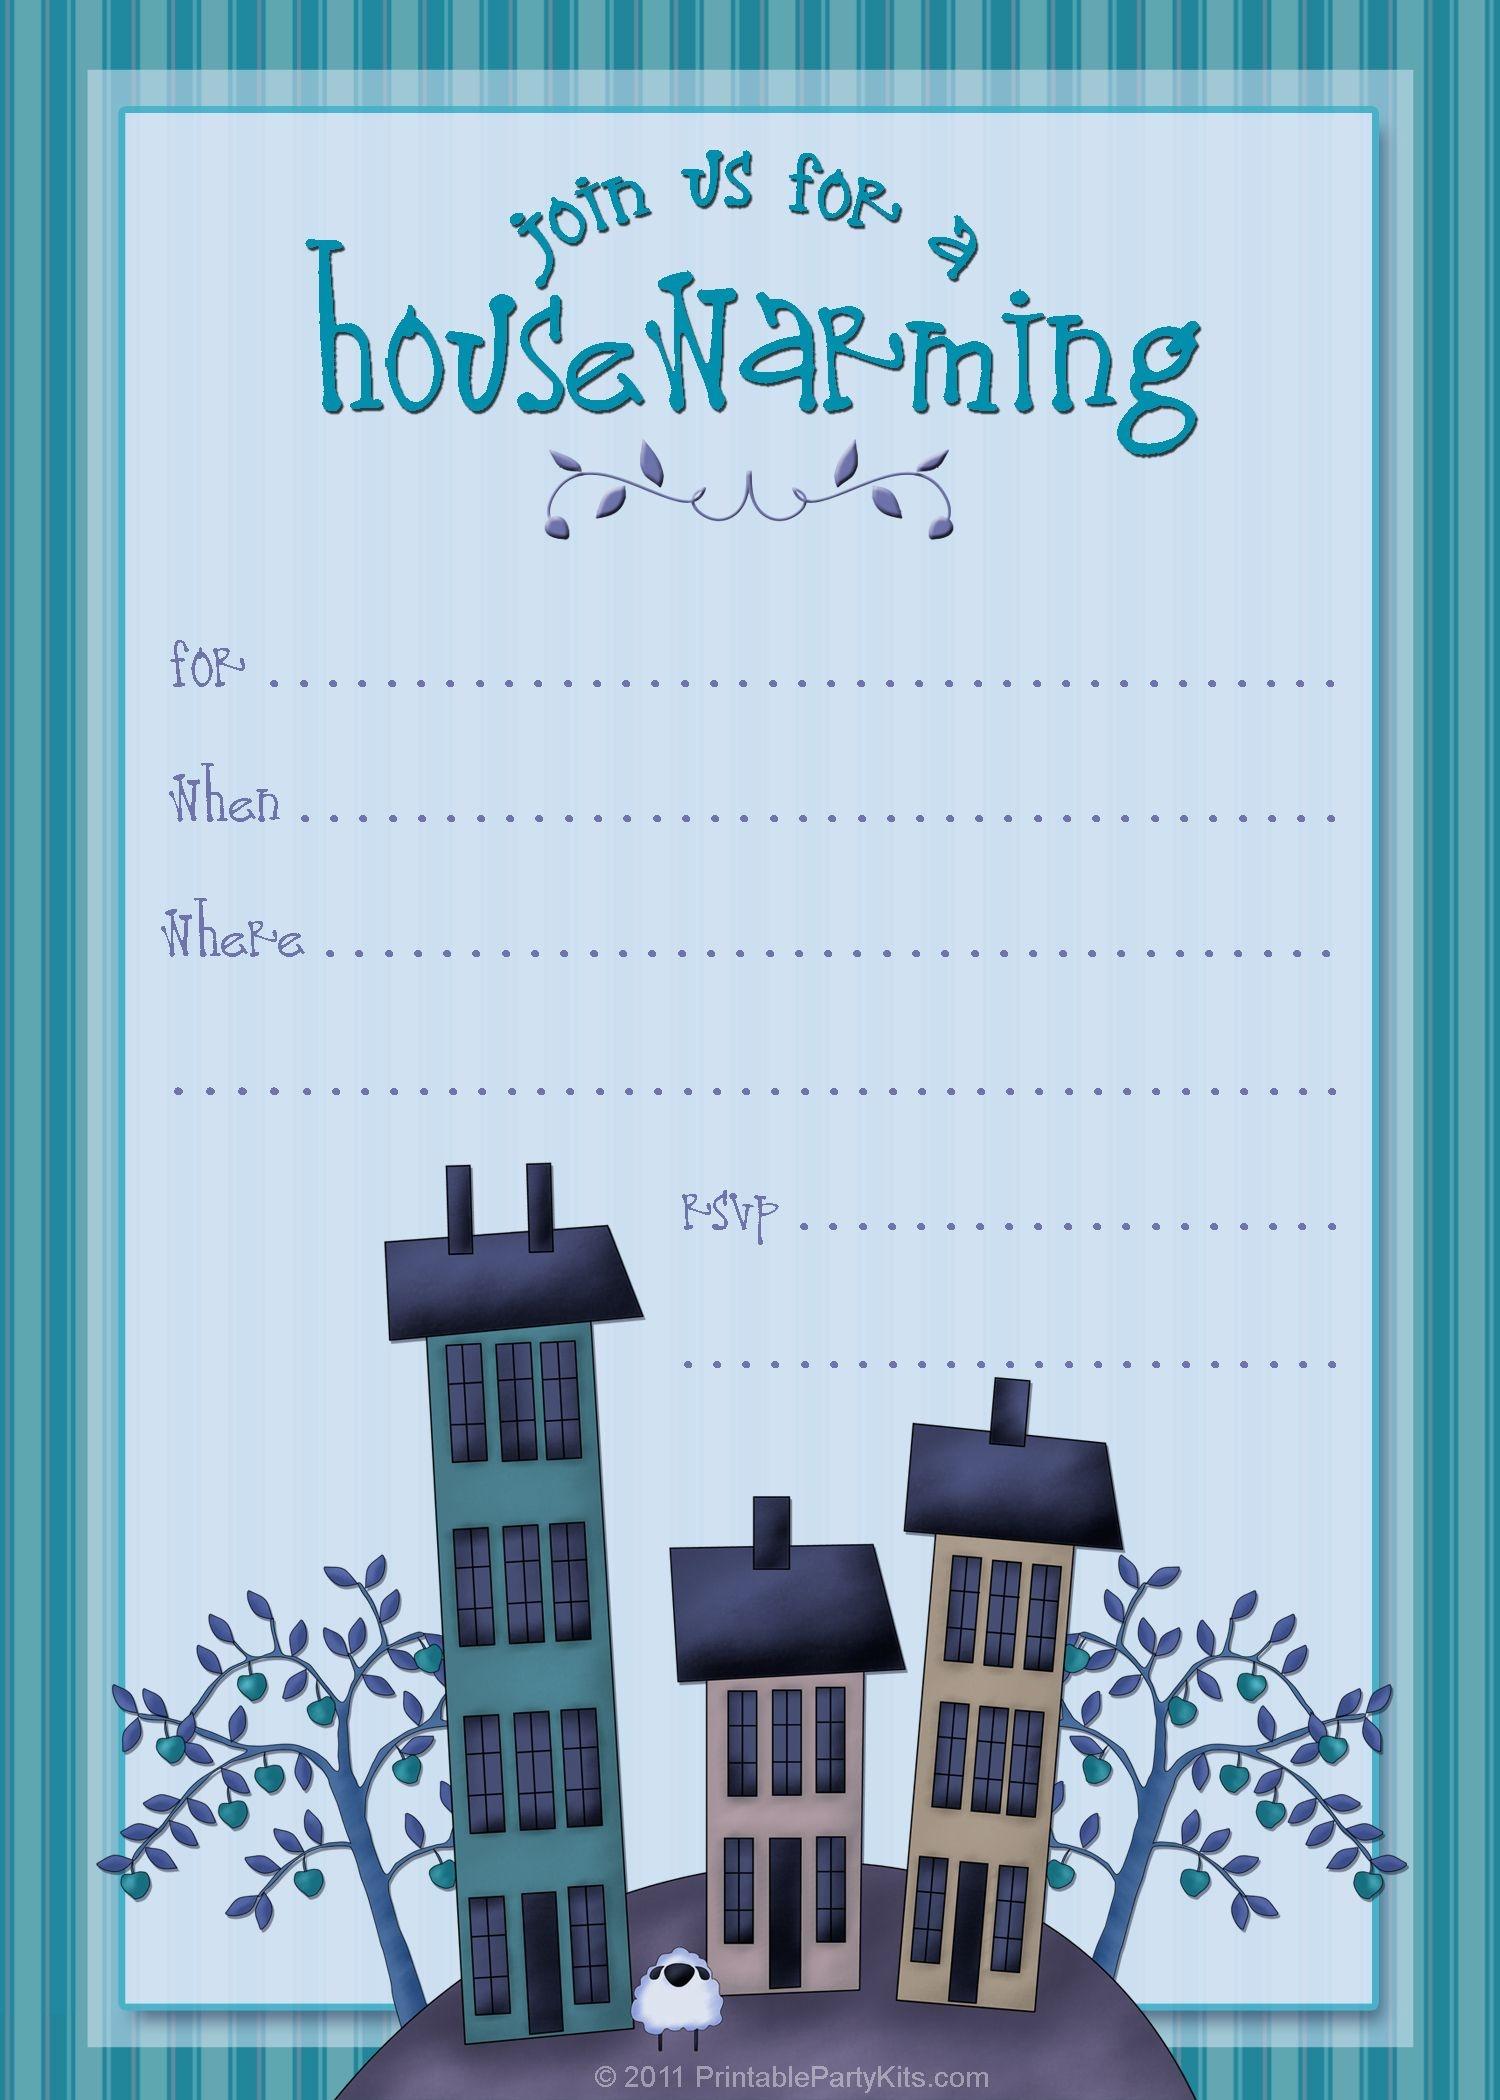 Housewarming Invite Template   Tanveer   Housewarming Party - Free Printable Housewarming Invitations Cards